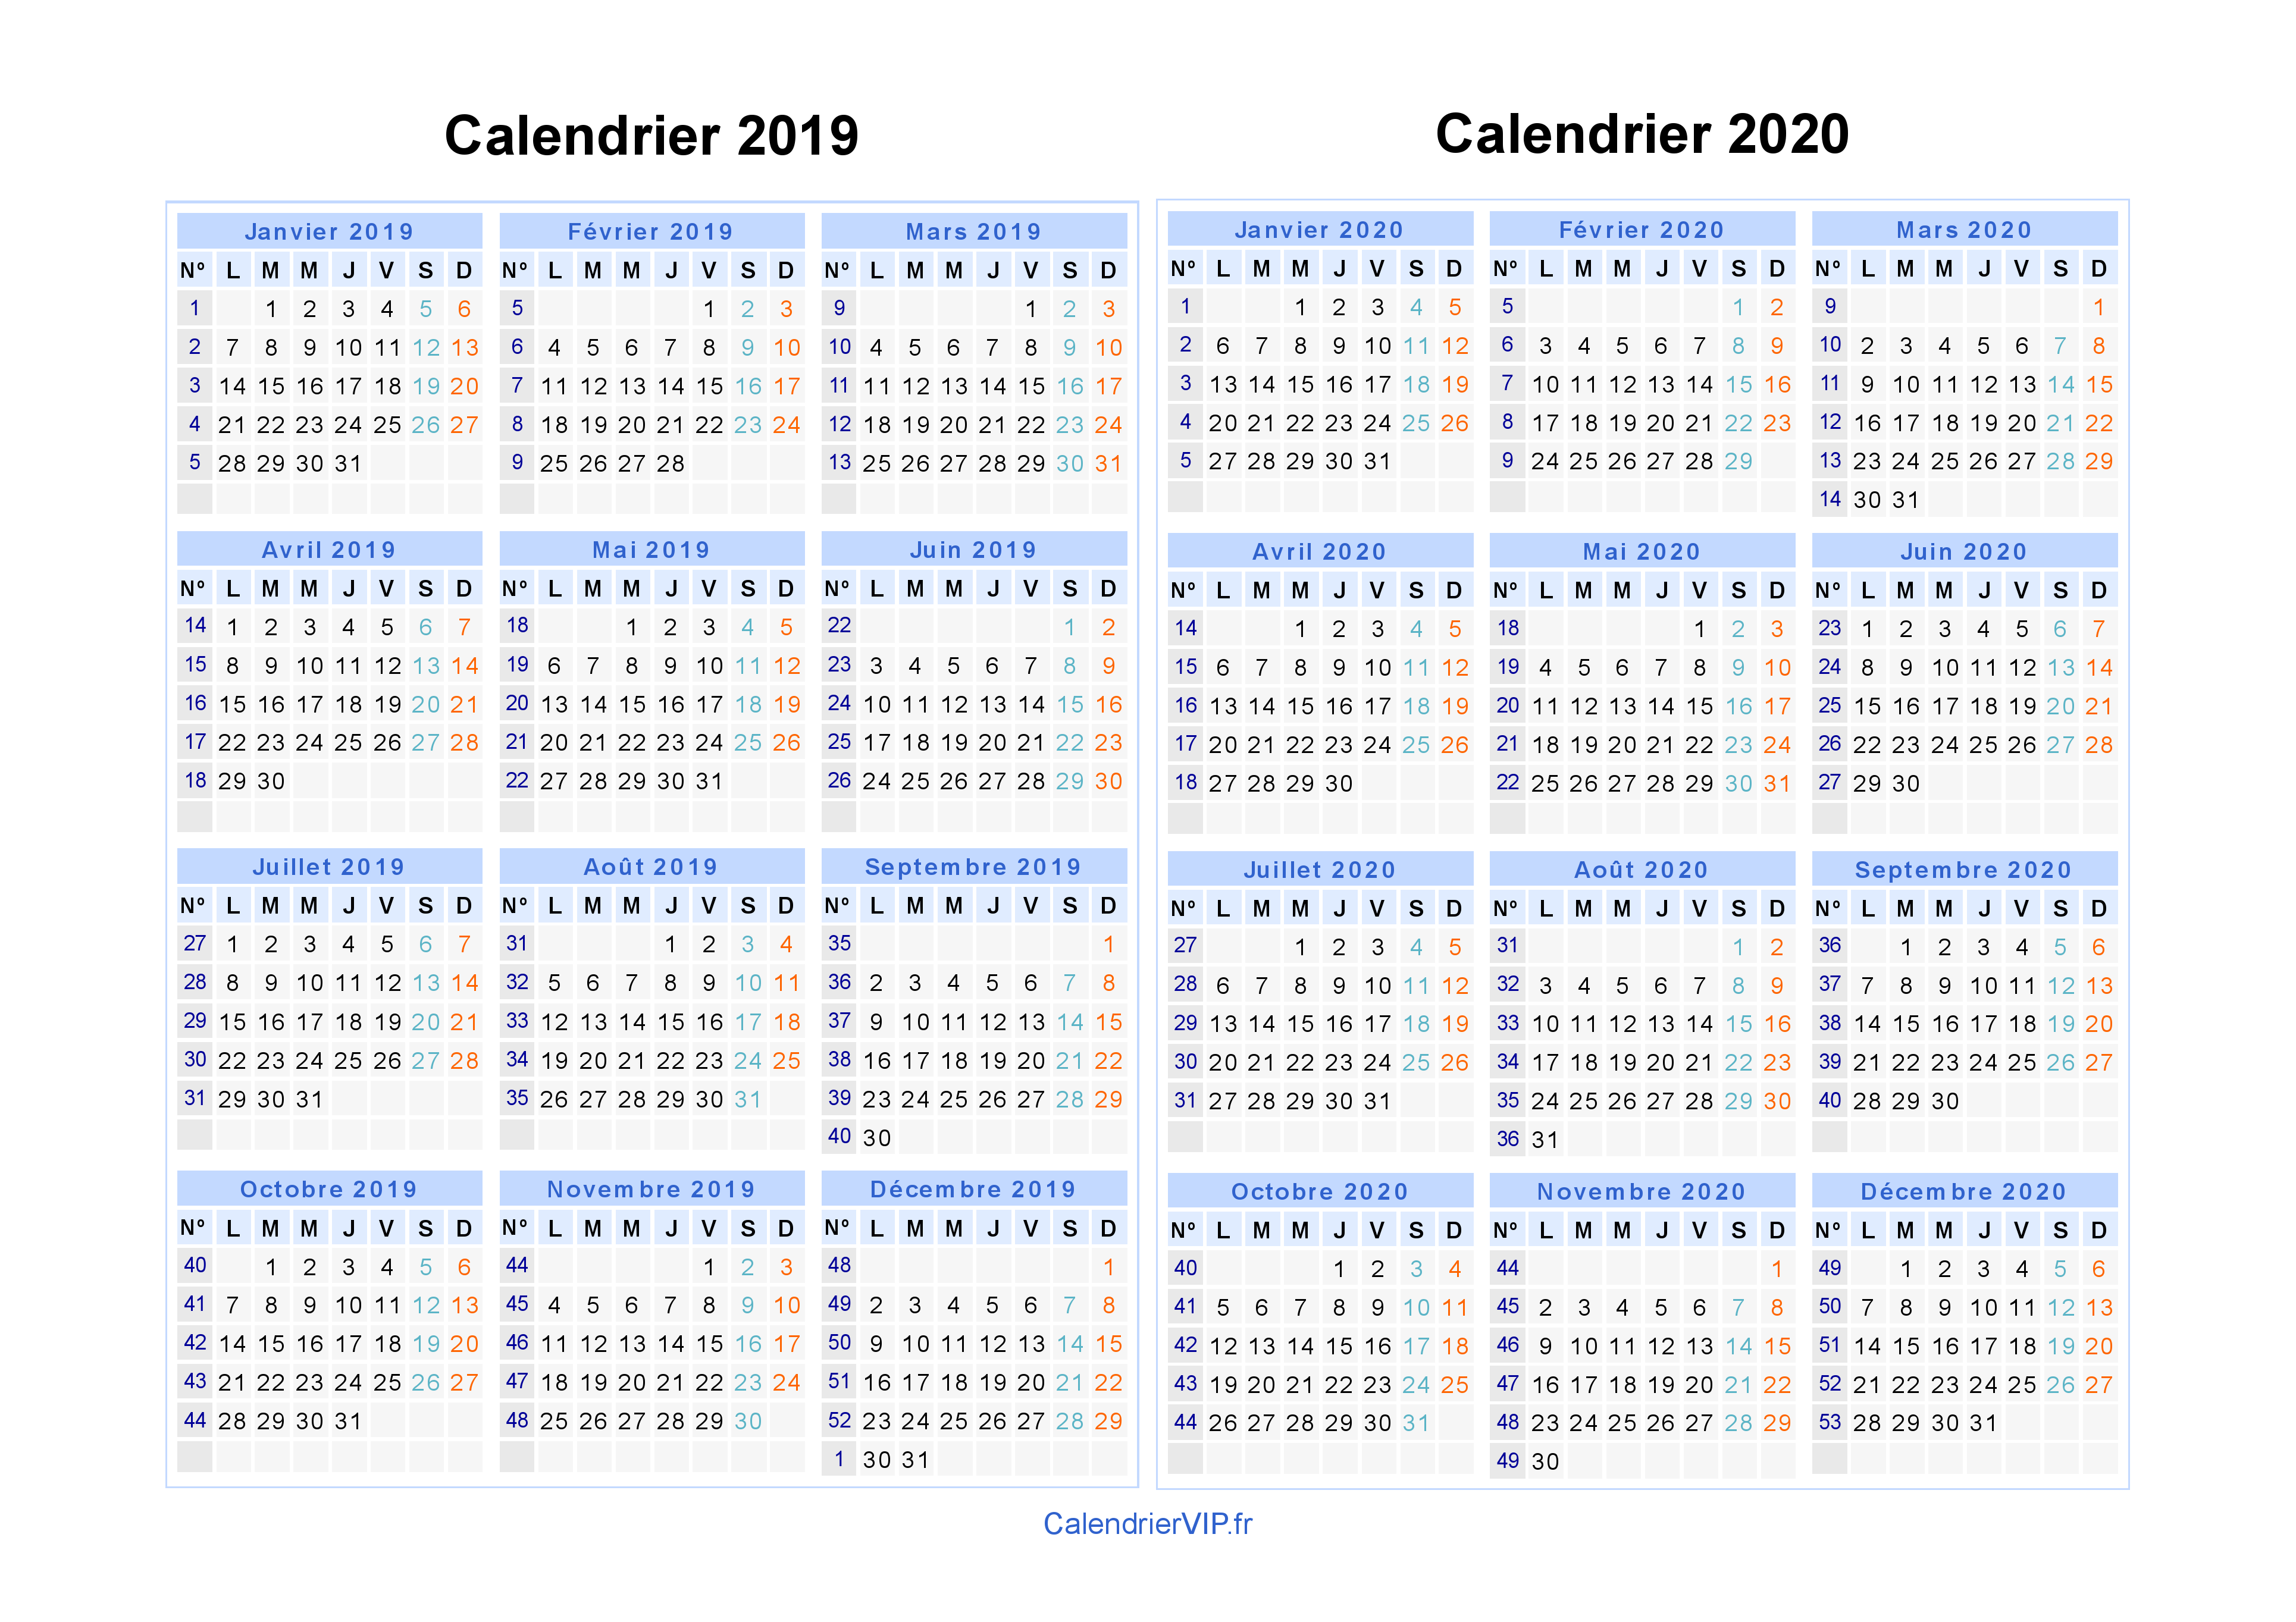 Calendrier A Imprimer Novembre 2020.Calendrier 2019 2020 A Imprimer Gratuit En Pdf Et Excel